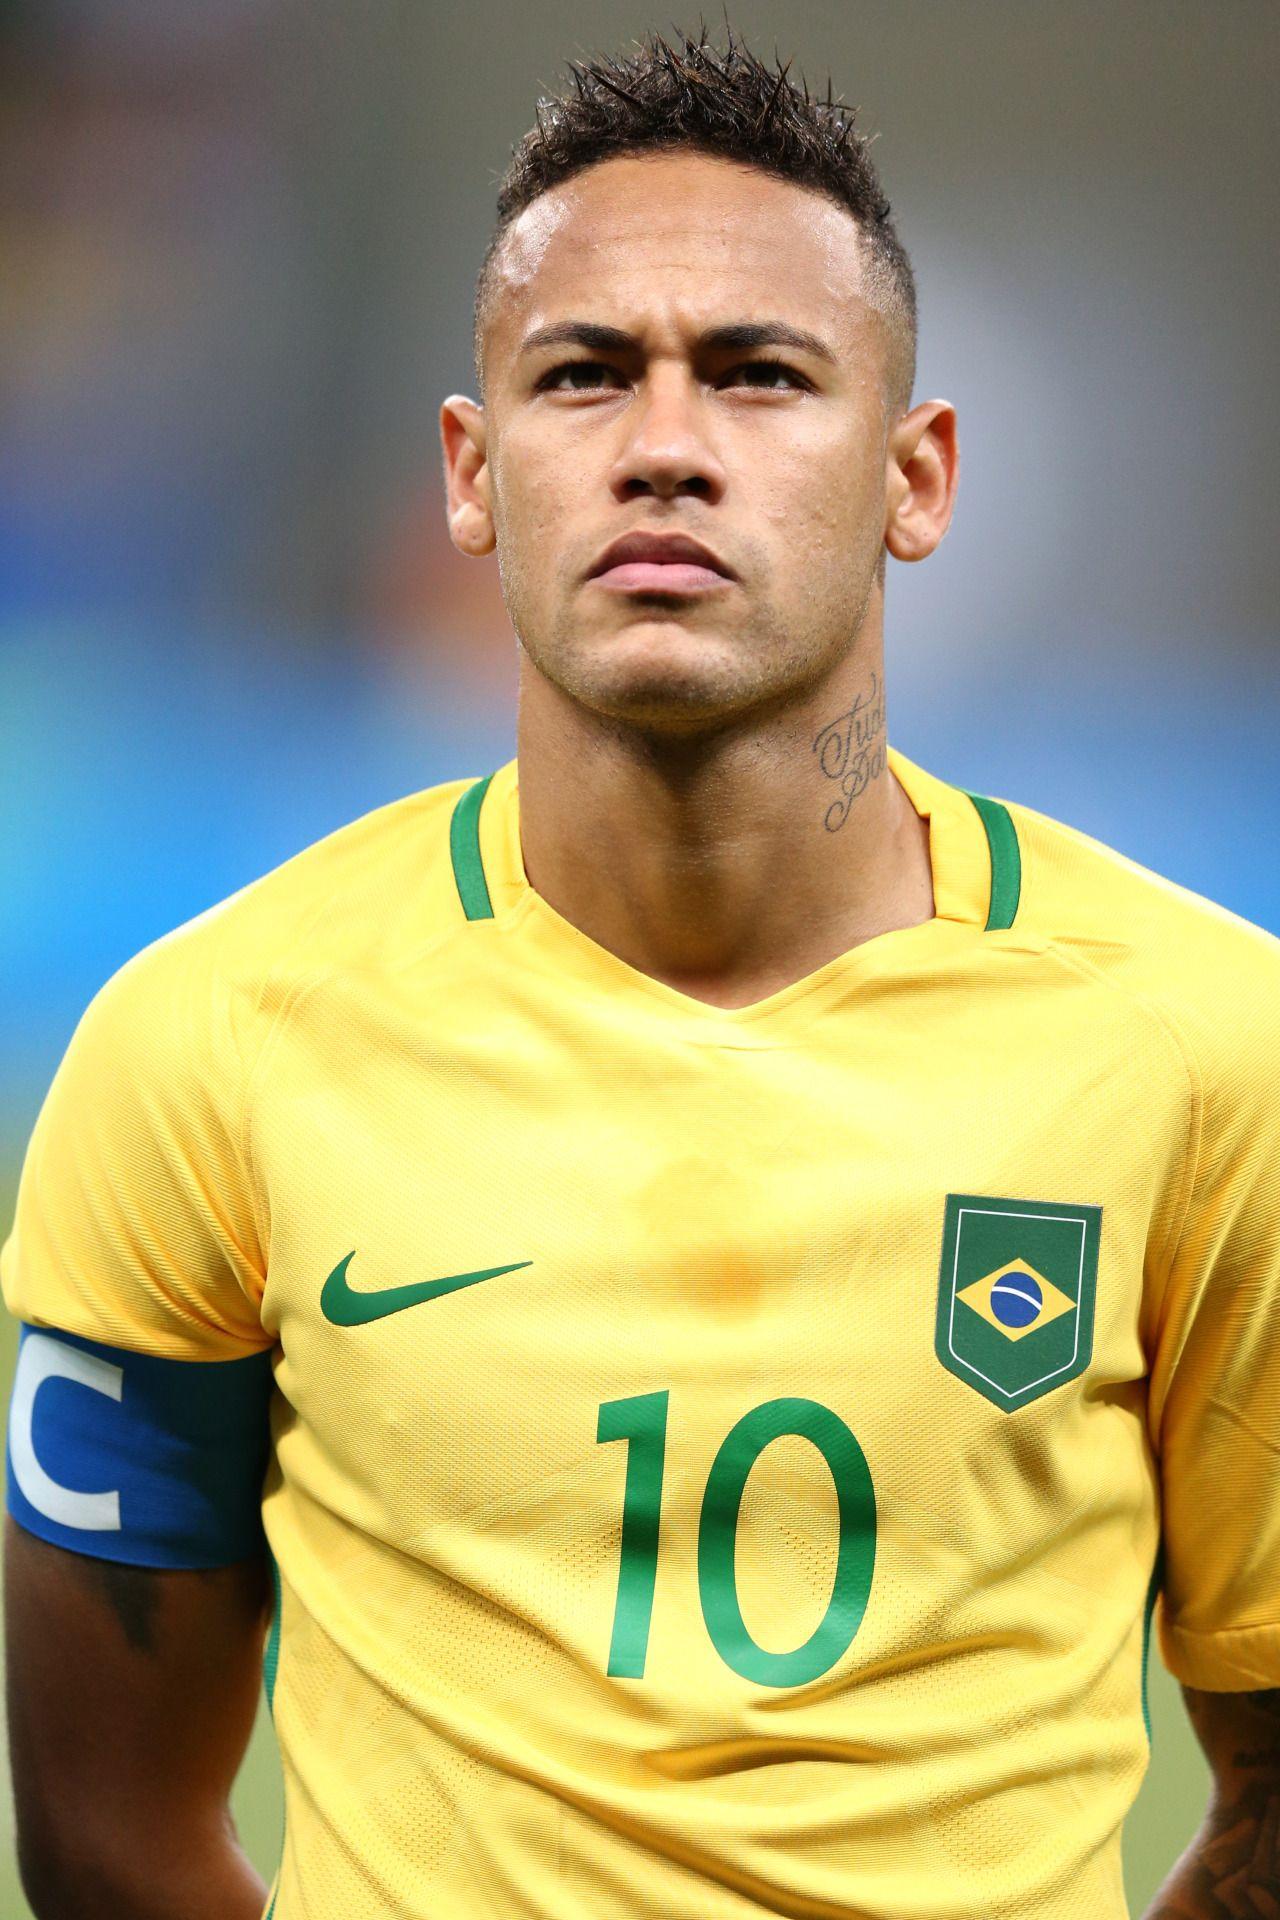 Neymar 10 Brazilian National Team Captain